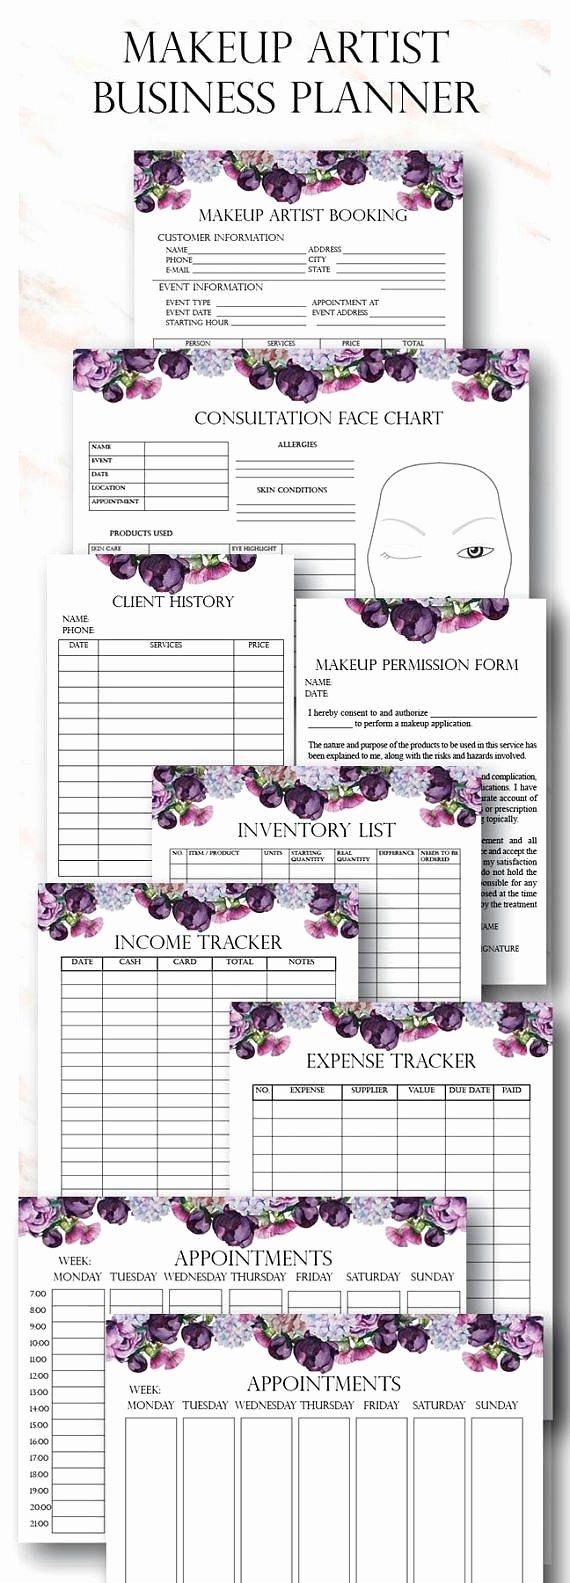 Freelance Makeup Contract Template Luxury Floral Makeup Artist Business Planner Bundle Freelance